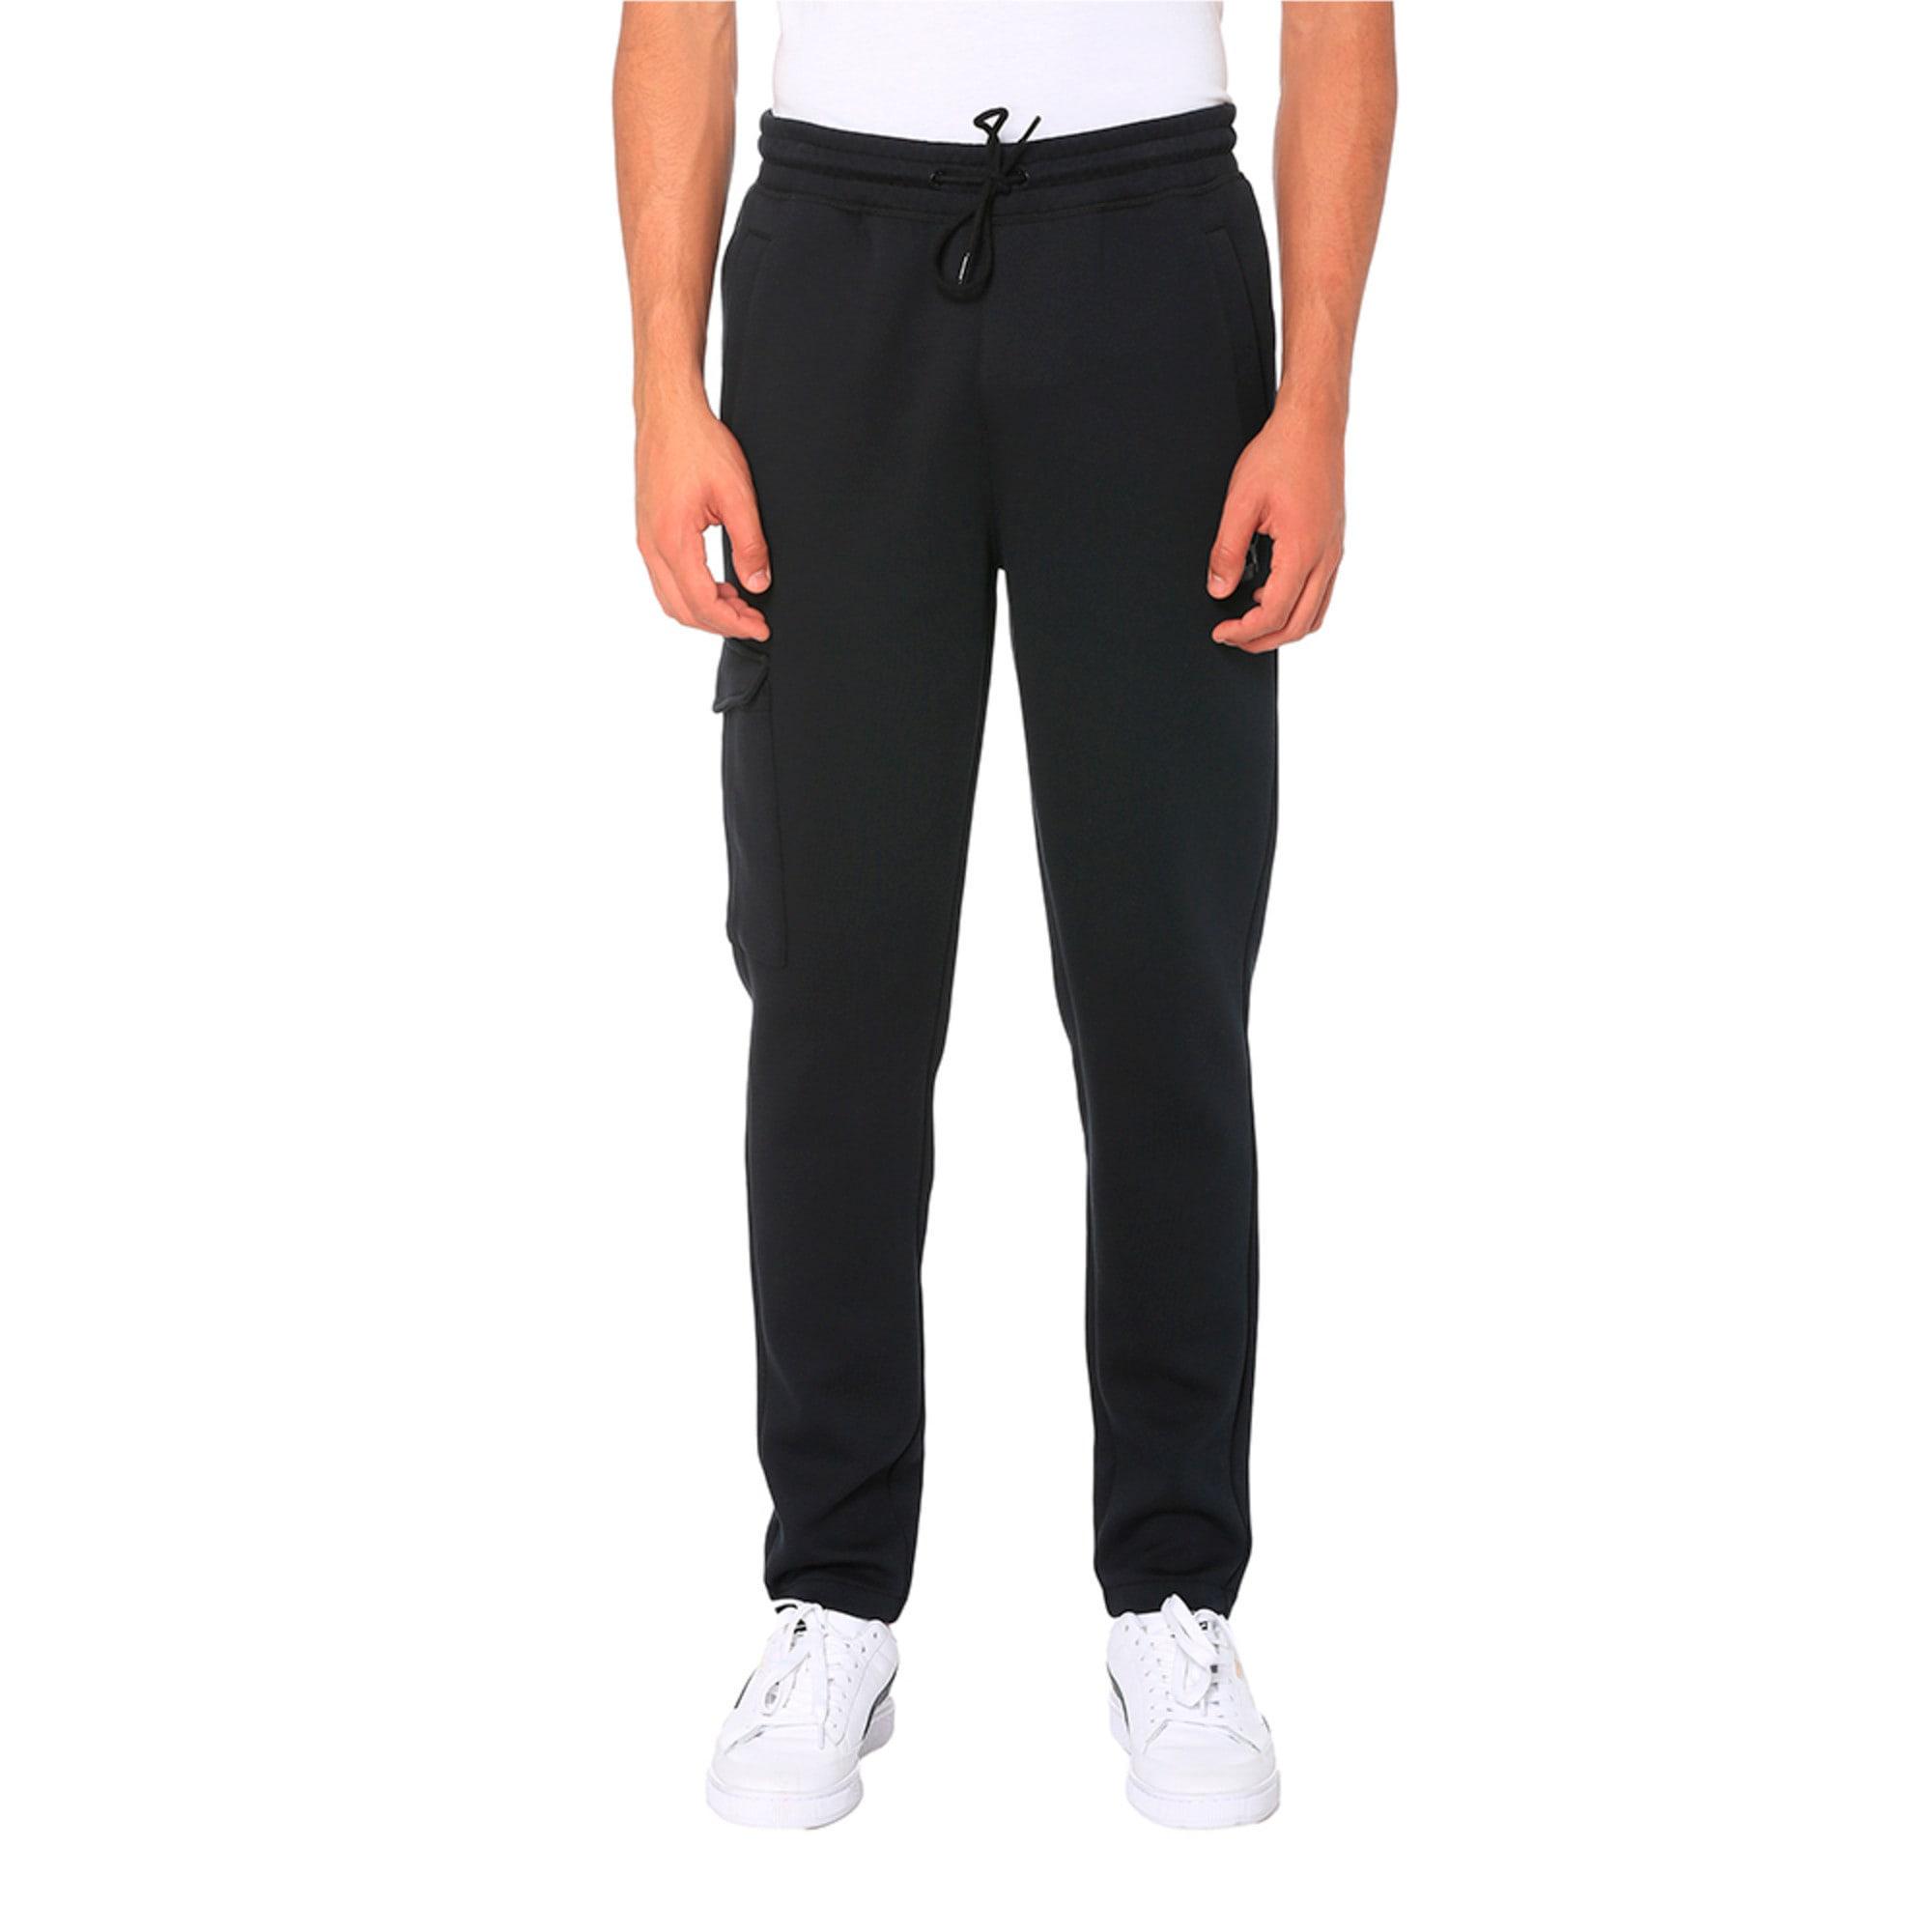 Thumbnail 1 of Classics Pocket Pants OH, Cotton Black, medium-IND